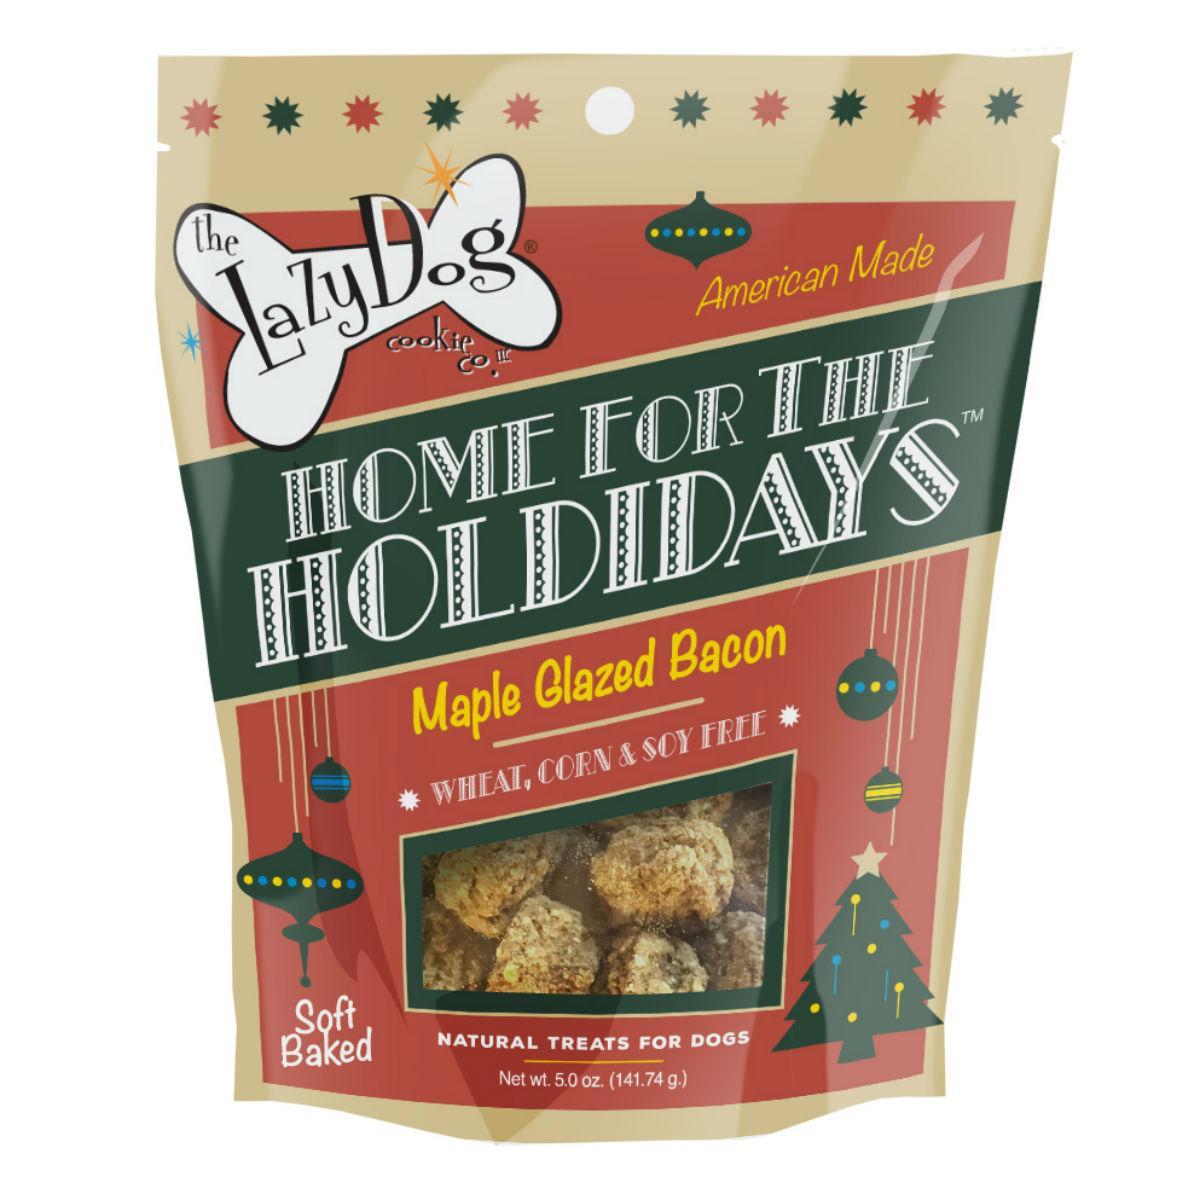 The Lazy Dog Home for the Holidays Dog Treats - Maple Glazed Bacon